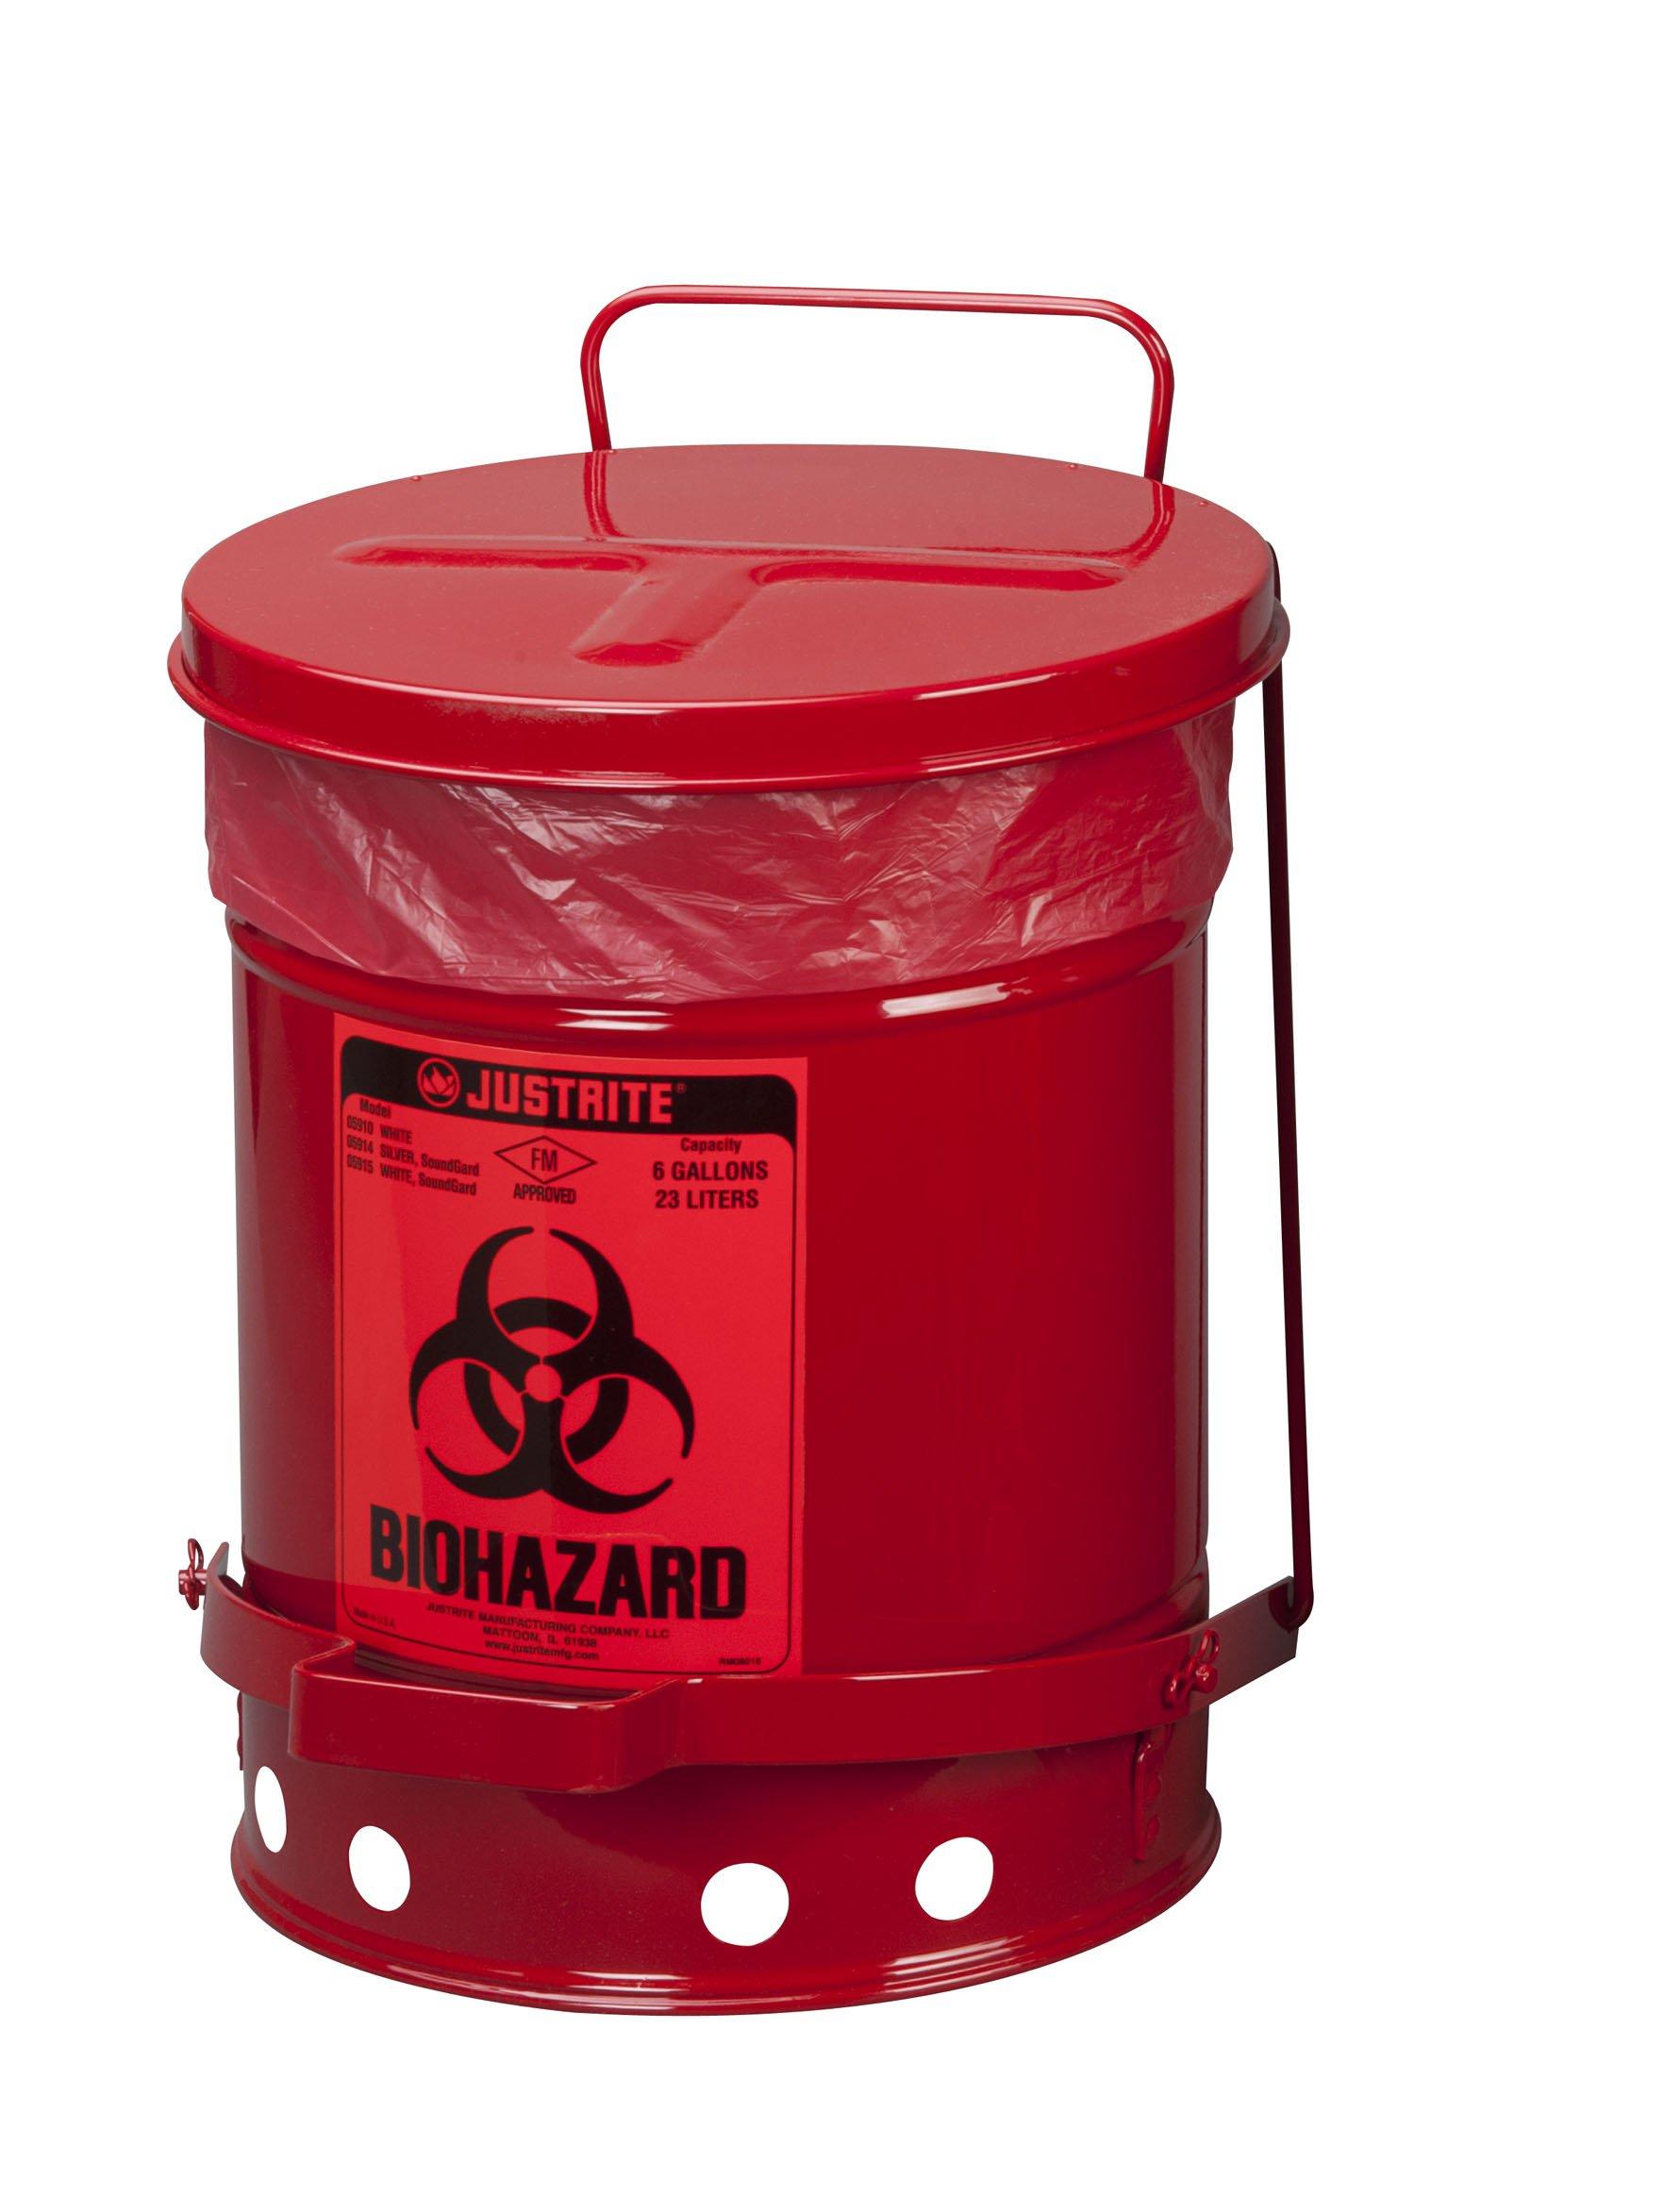 Justrite 05910R Steel Biohazard Waste Can, 6 Gallon Capacity, Red